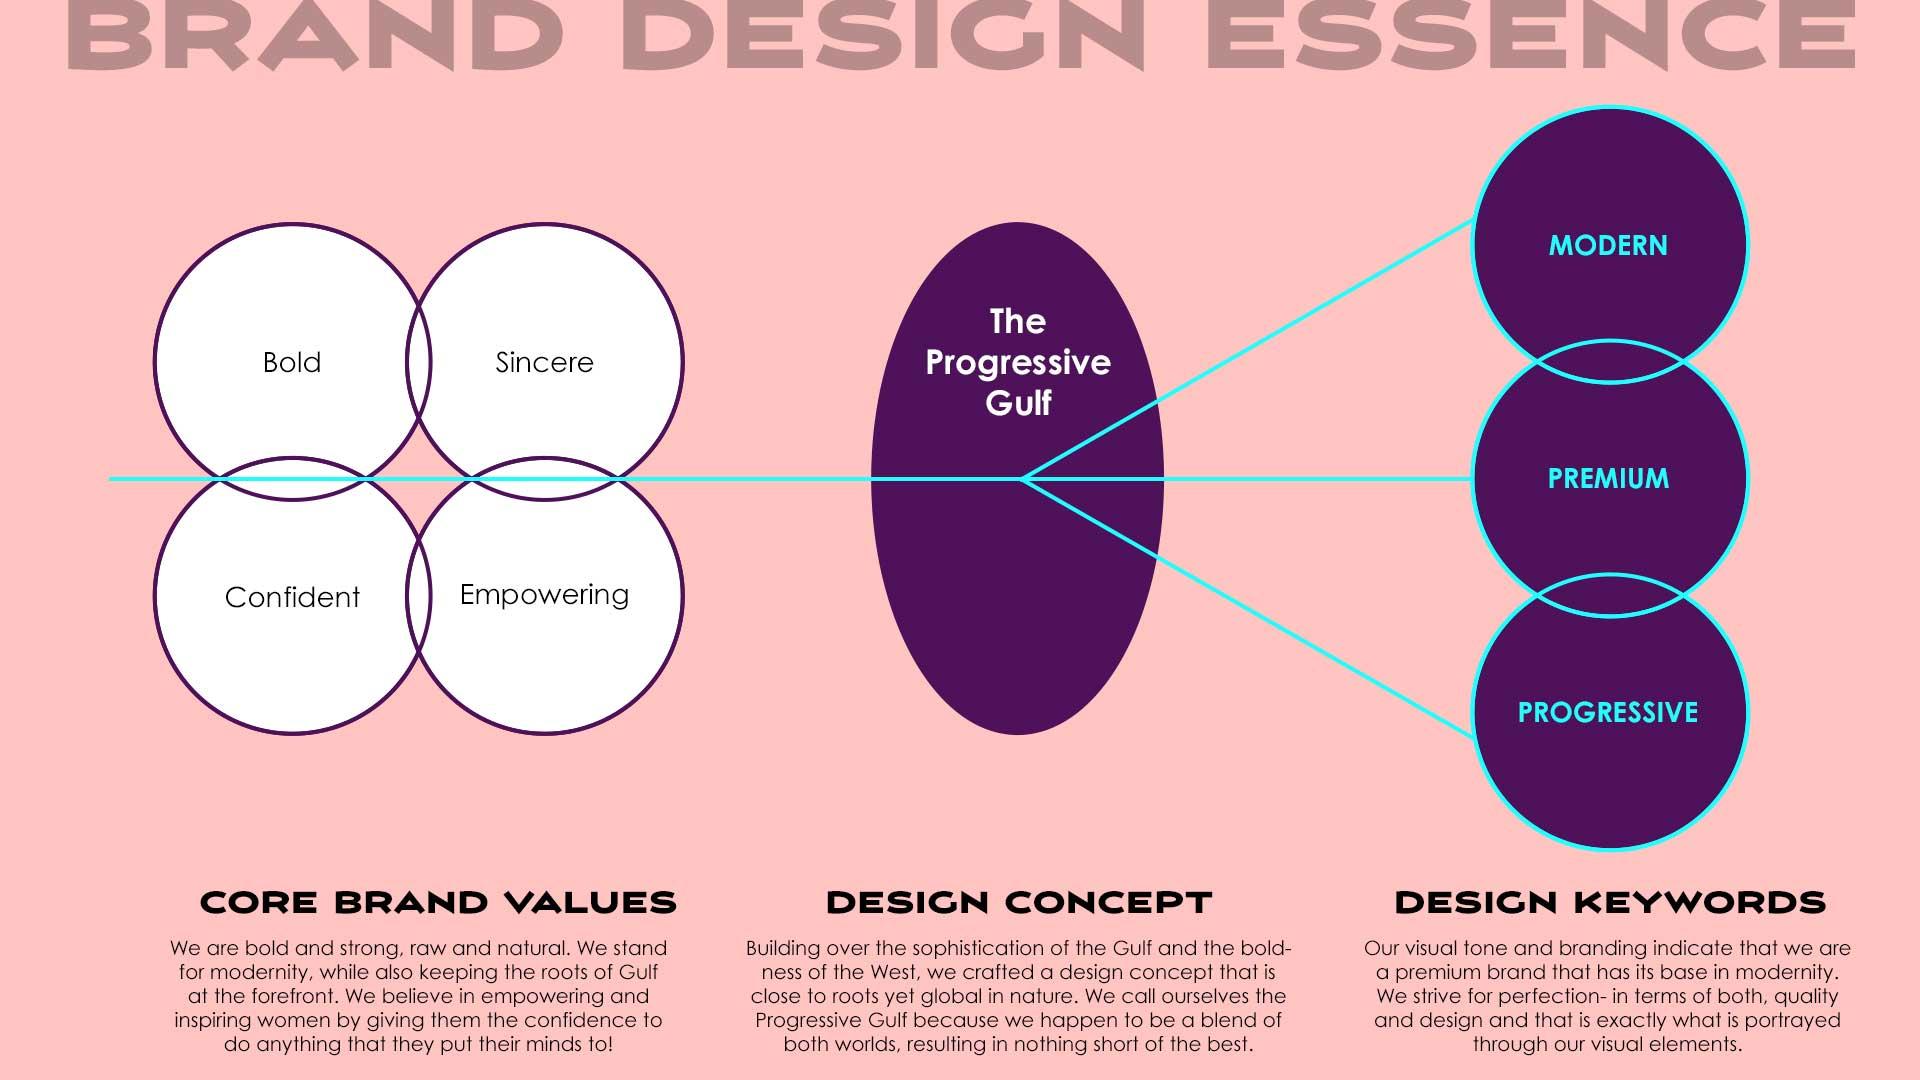 The Fashion Net Brand Design Essence